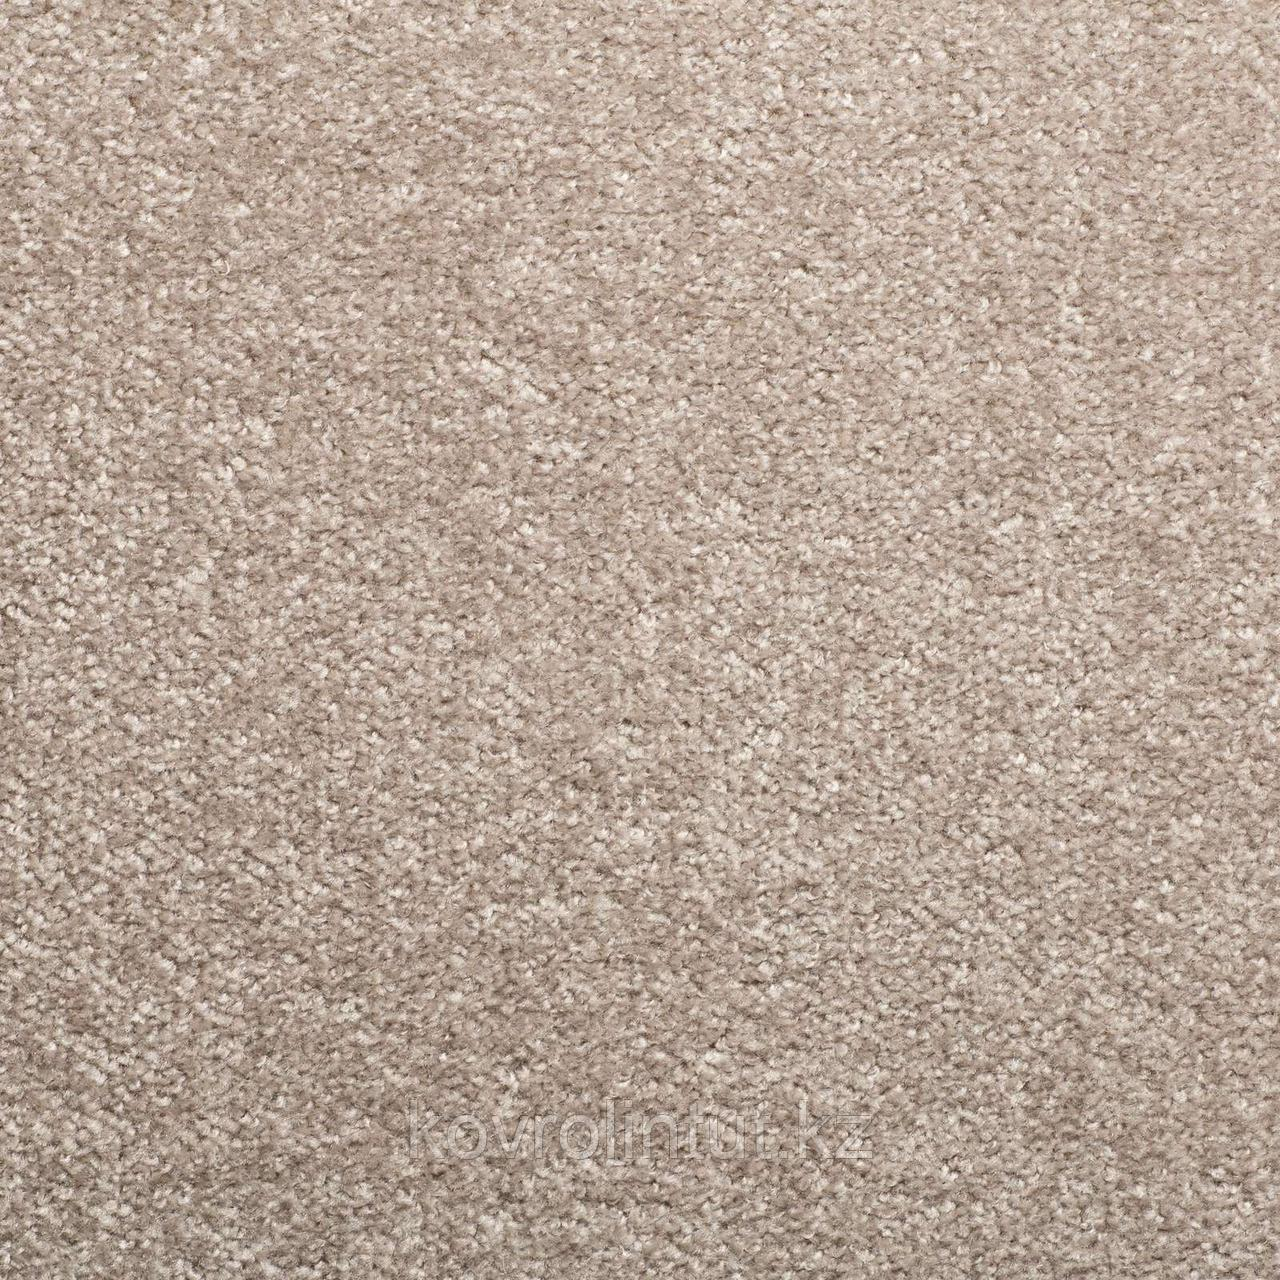 Ковровое покрытие Sintelon SPARK TERMO 31554 серый 3 м